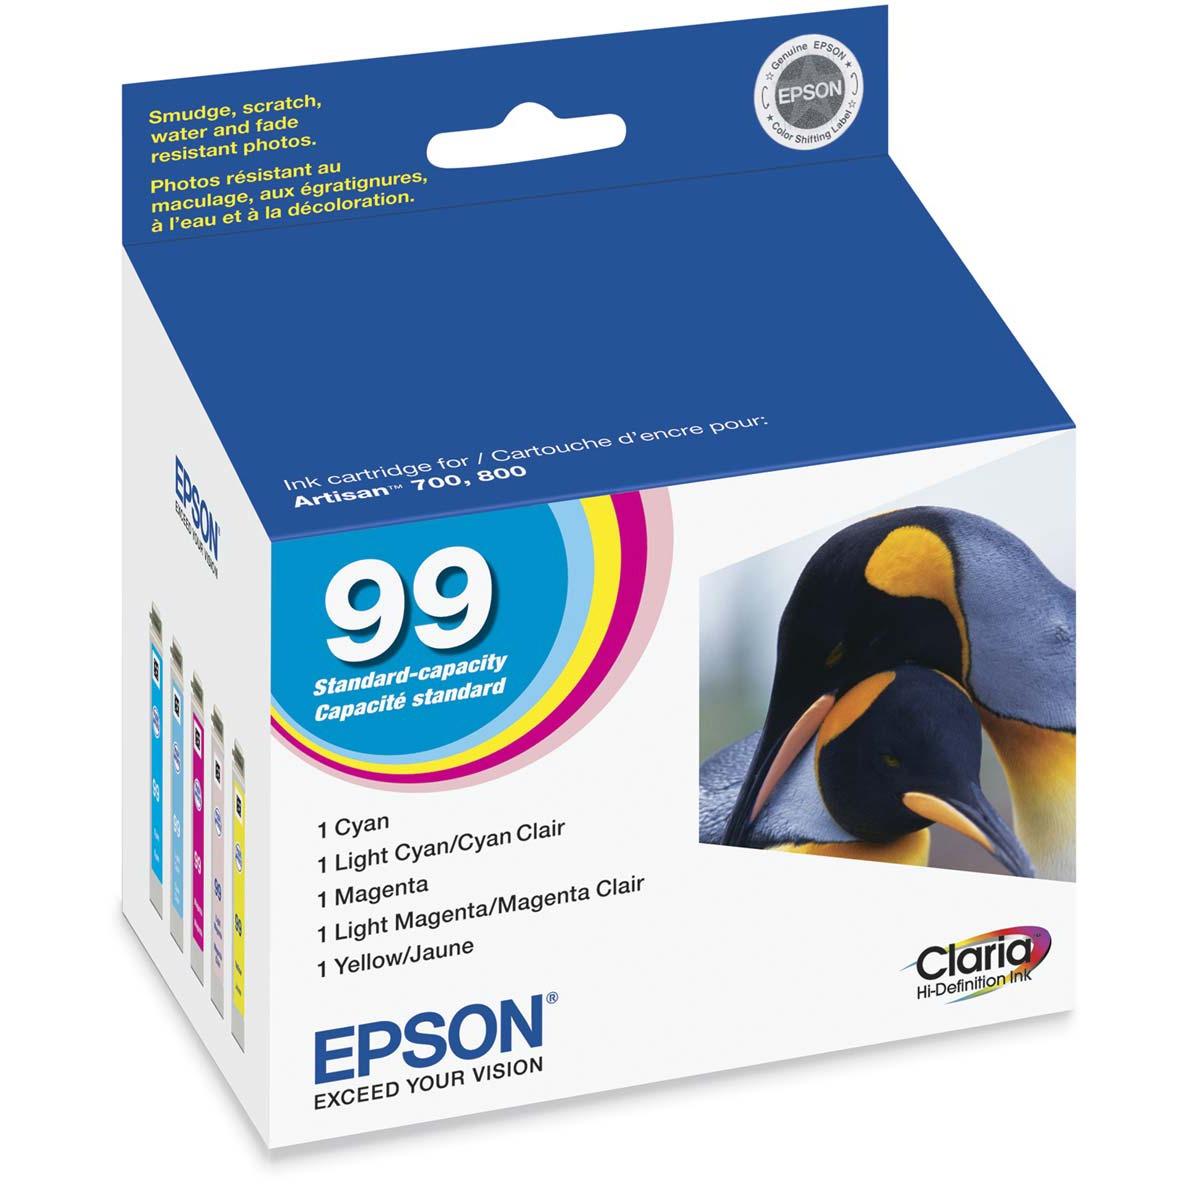 Epson, EPST099920, T099920 Printer Ink Cartridge Set, 1 Pack